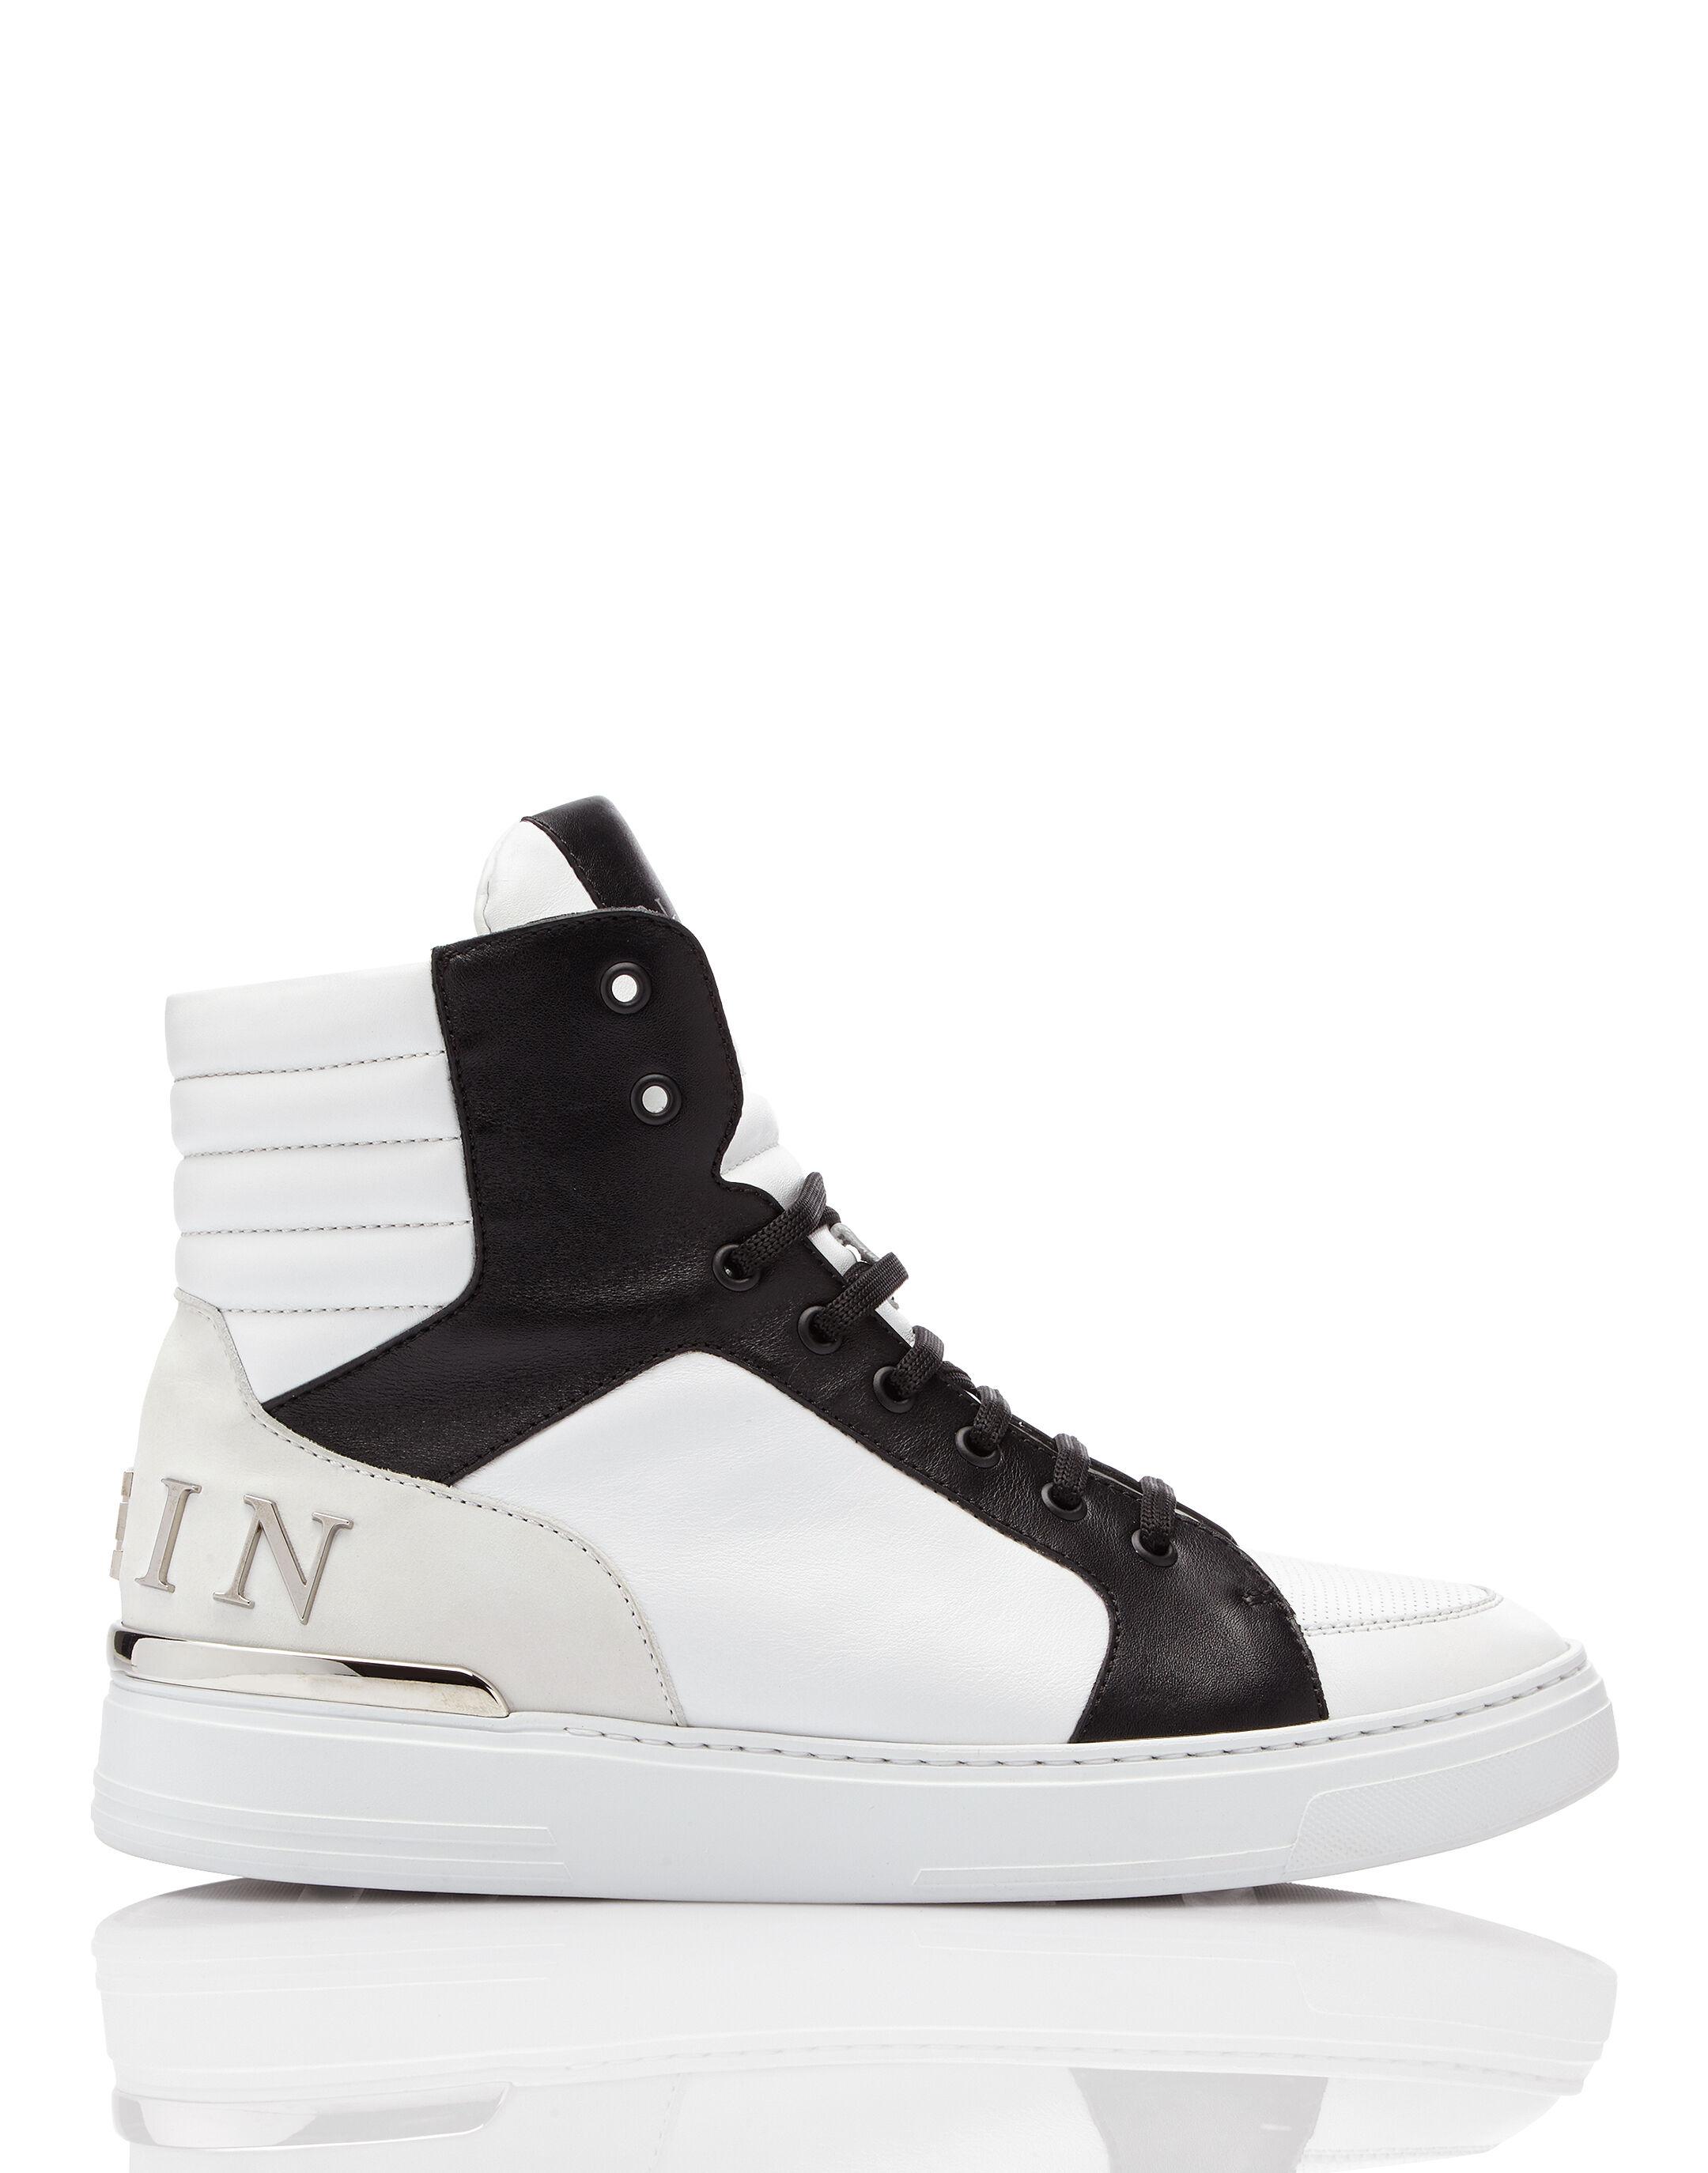 Chaussures - Haute-tops Et Baskets Footware Australian D0QC71g1